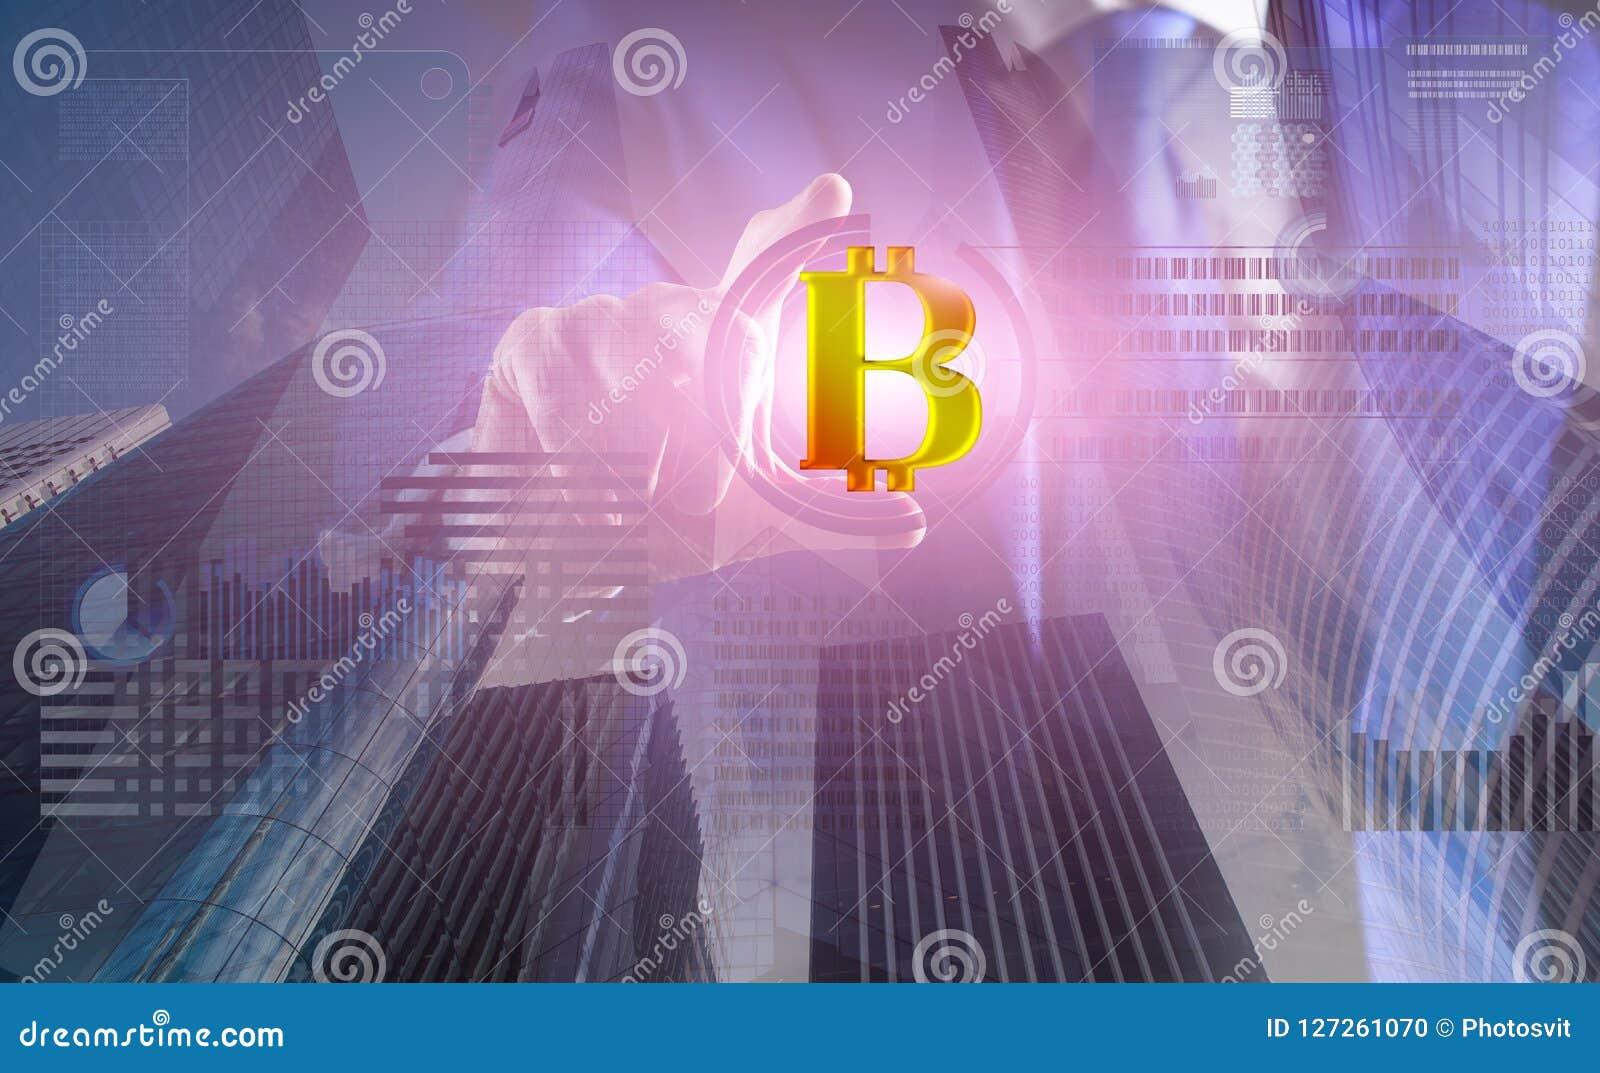 how to earn digital money